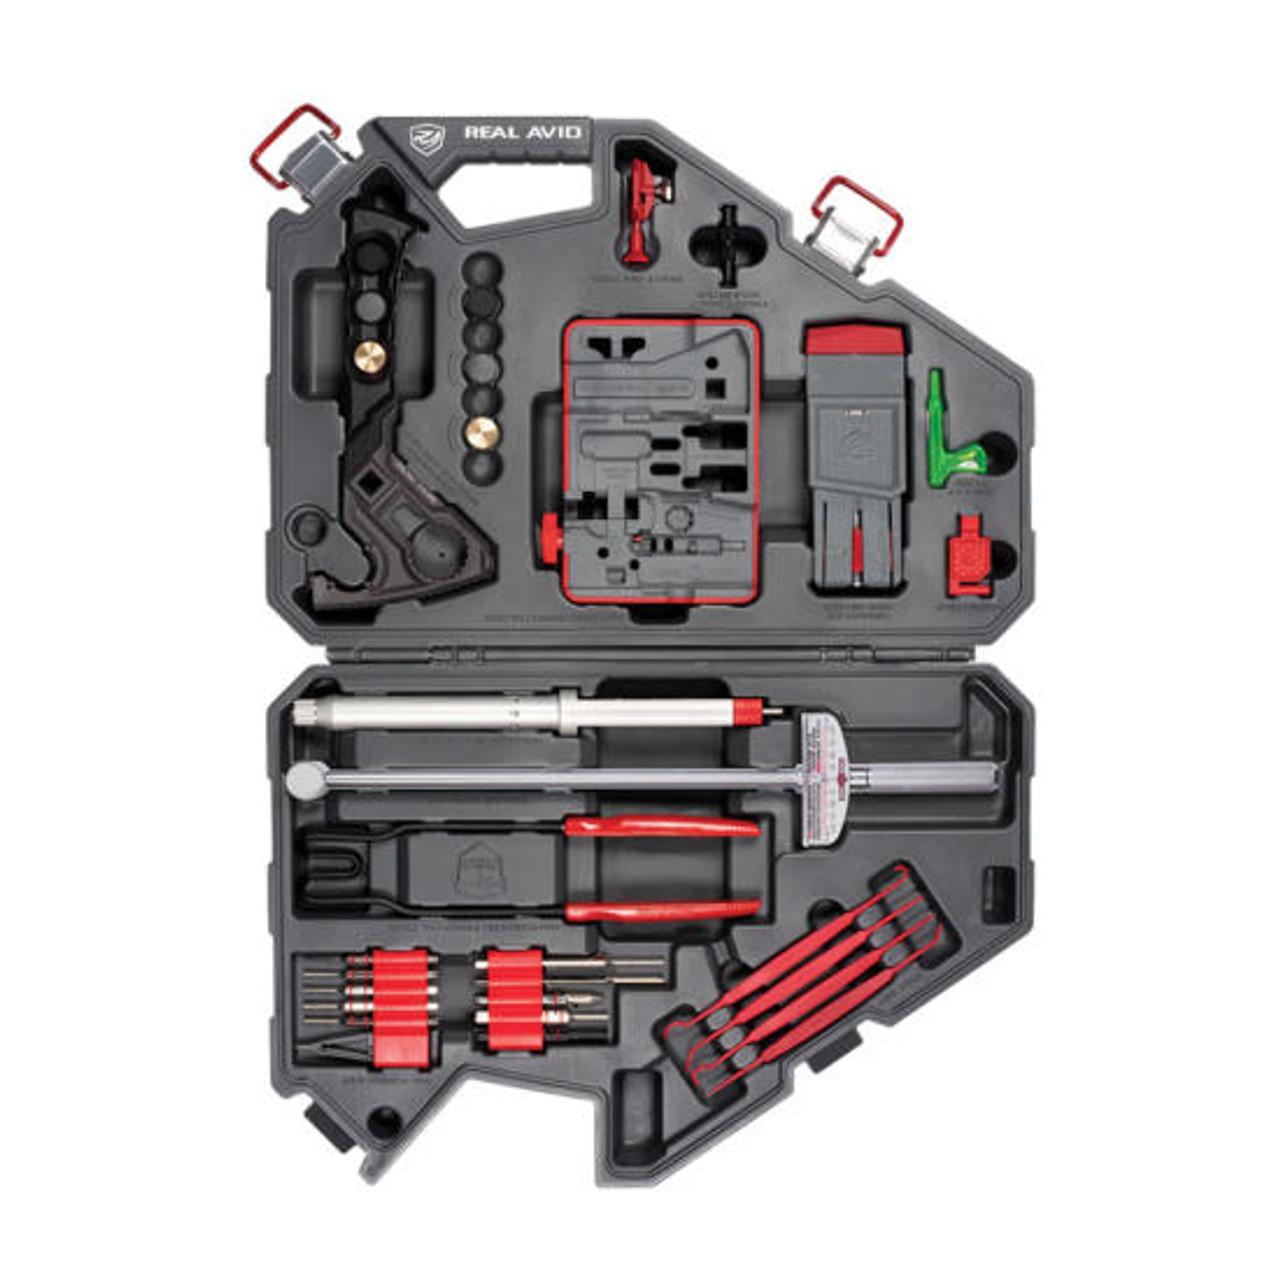 Real Avid AR-15 Armorer's Master Kit